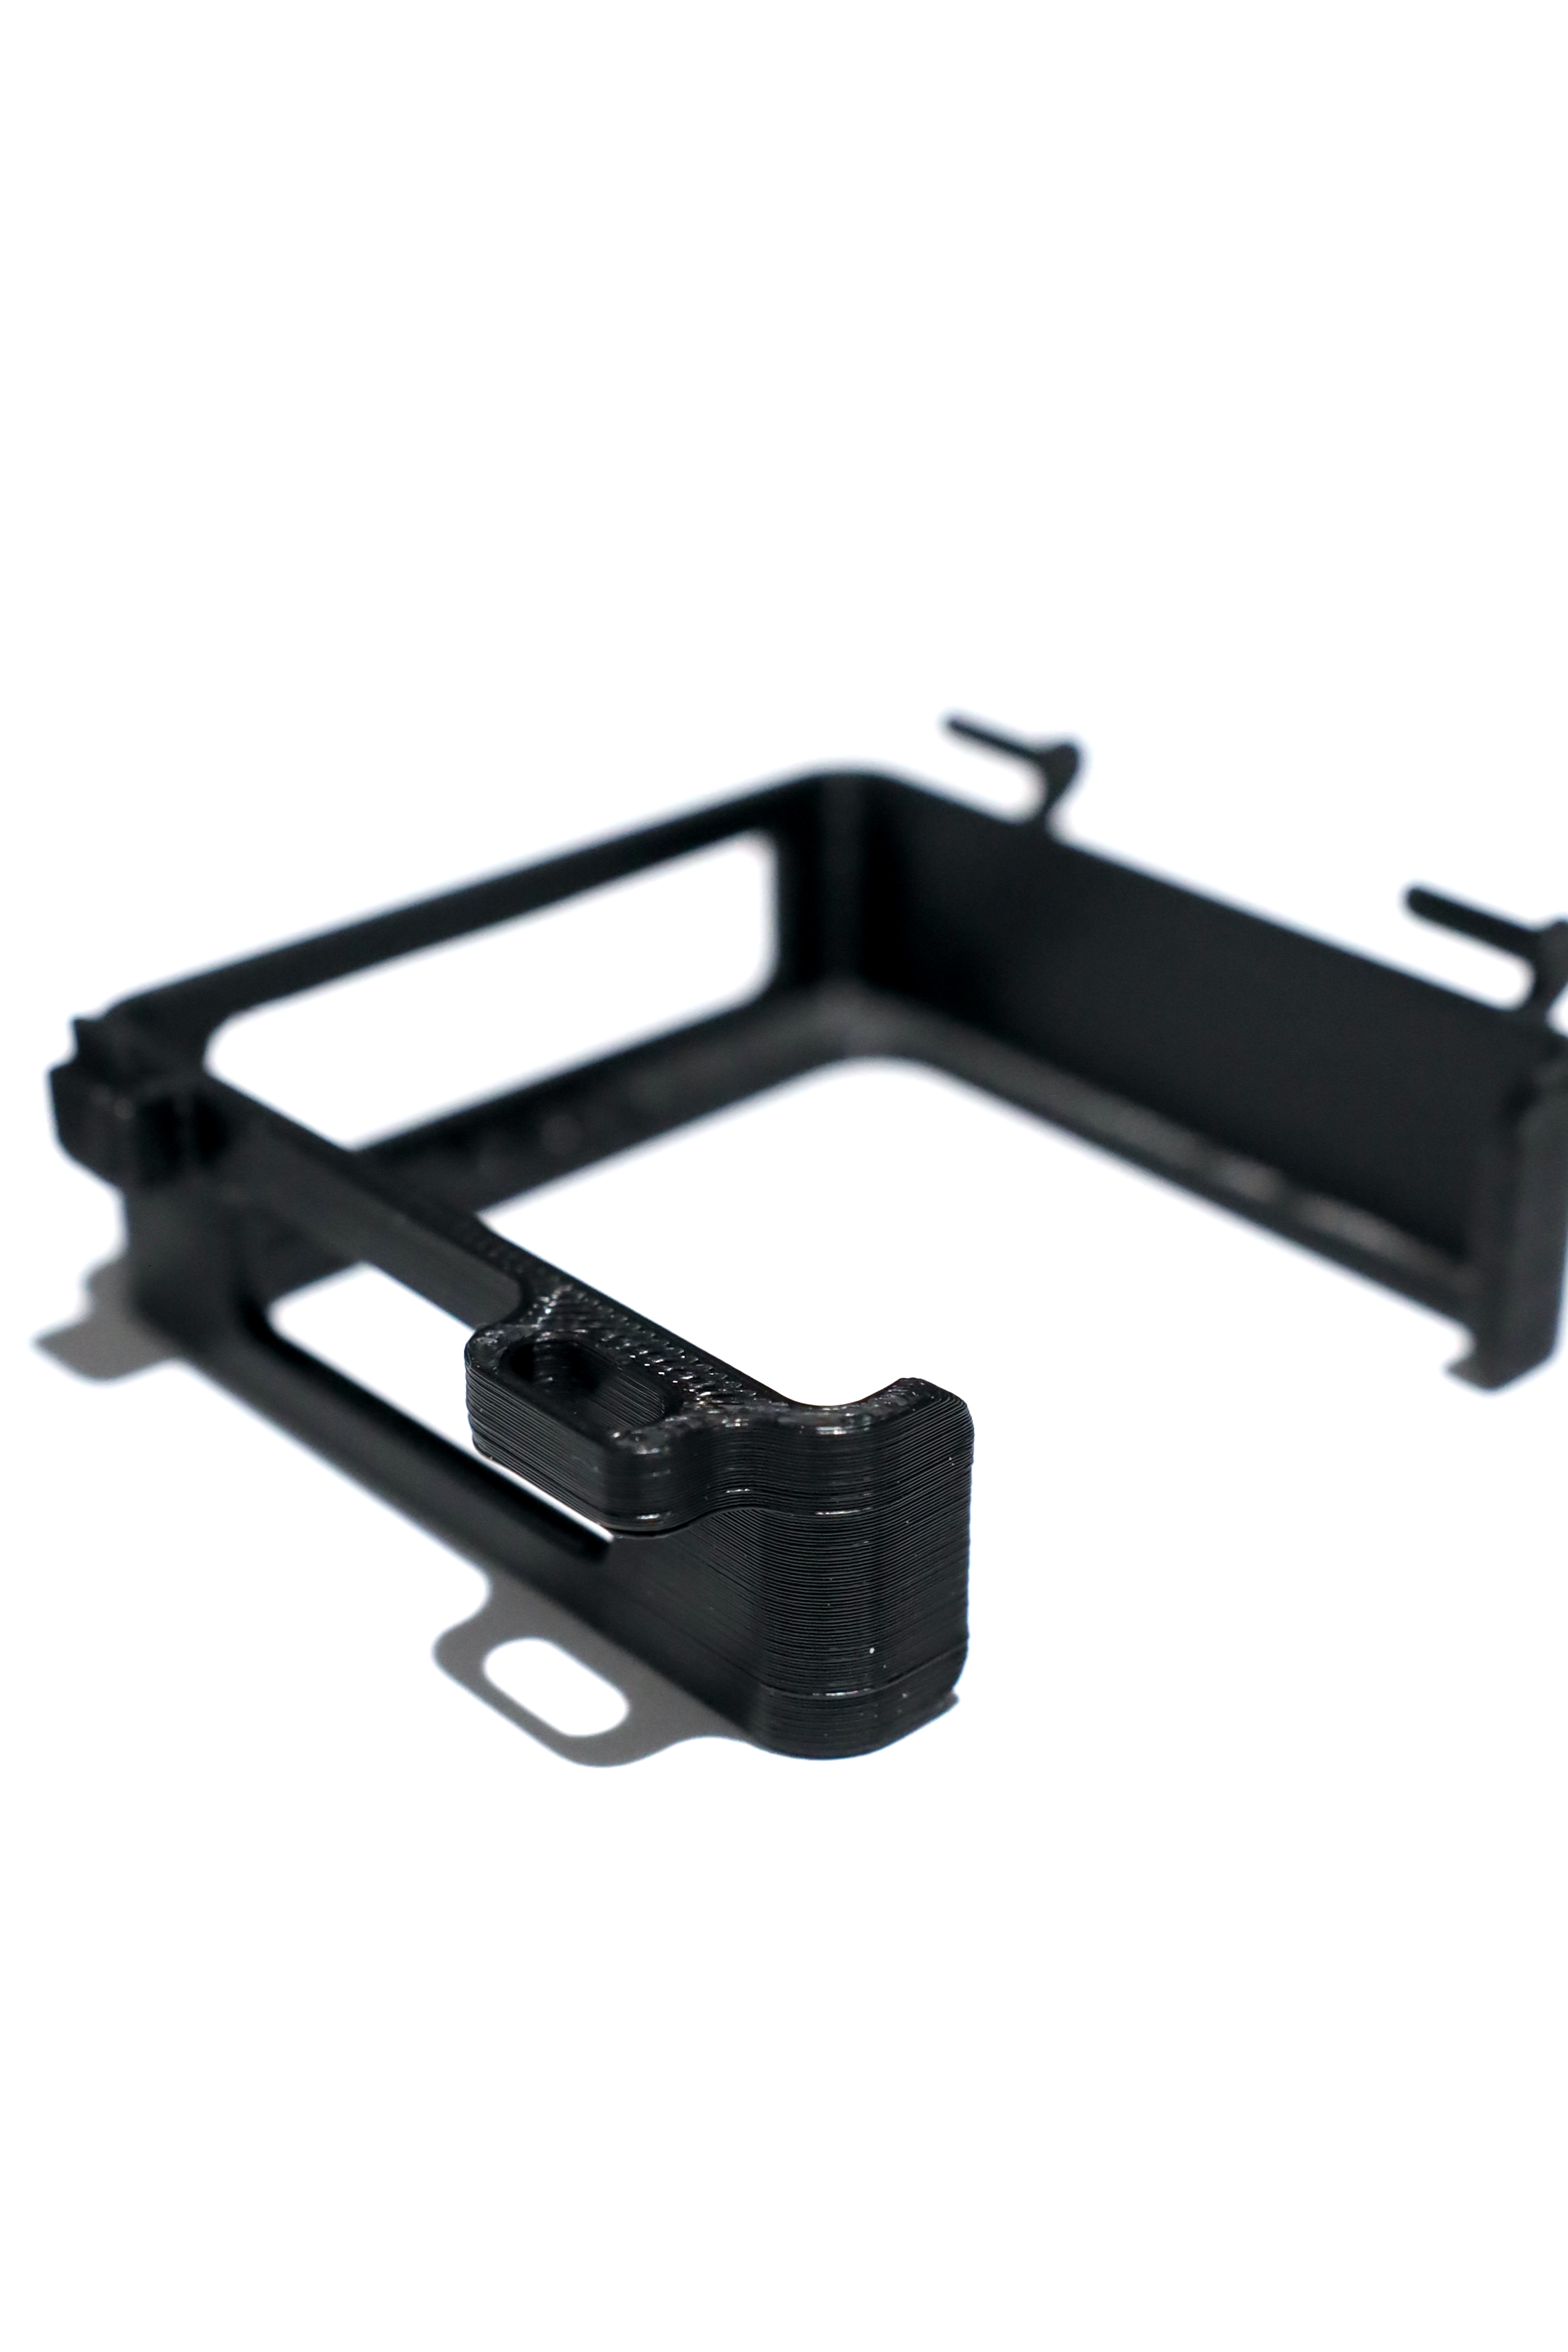 3D Printing Materials - PETG - Makelab - Engineer Part Casing